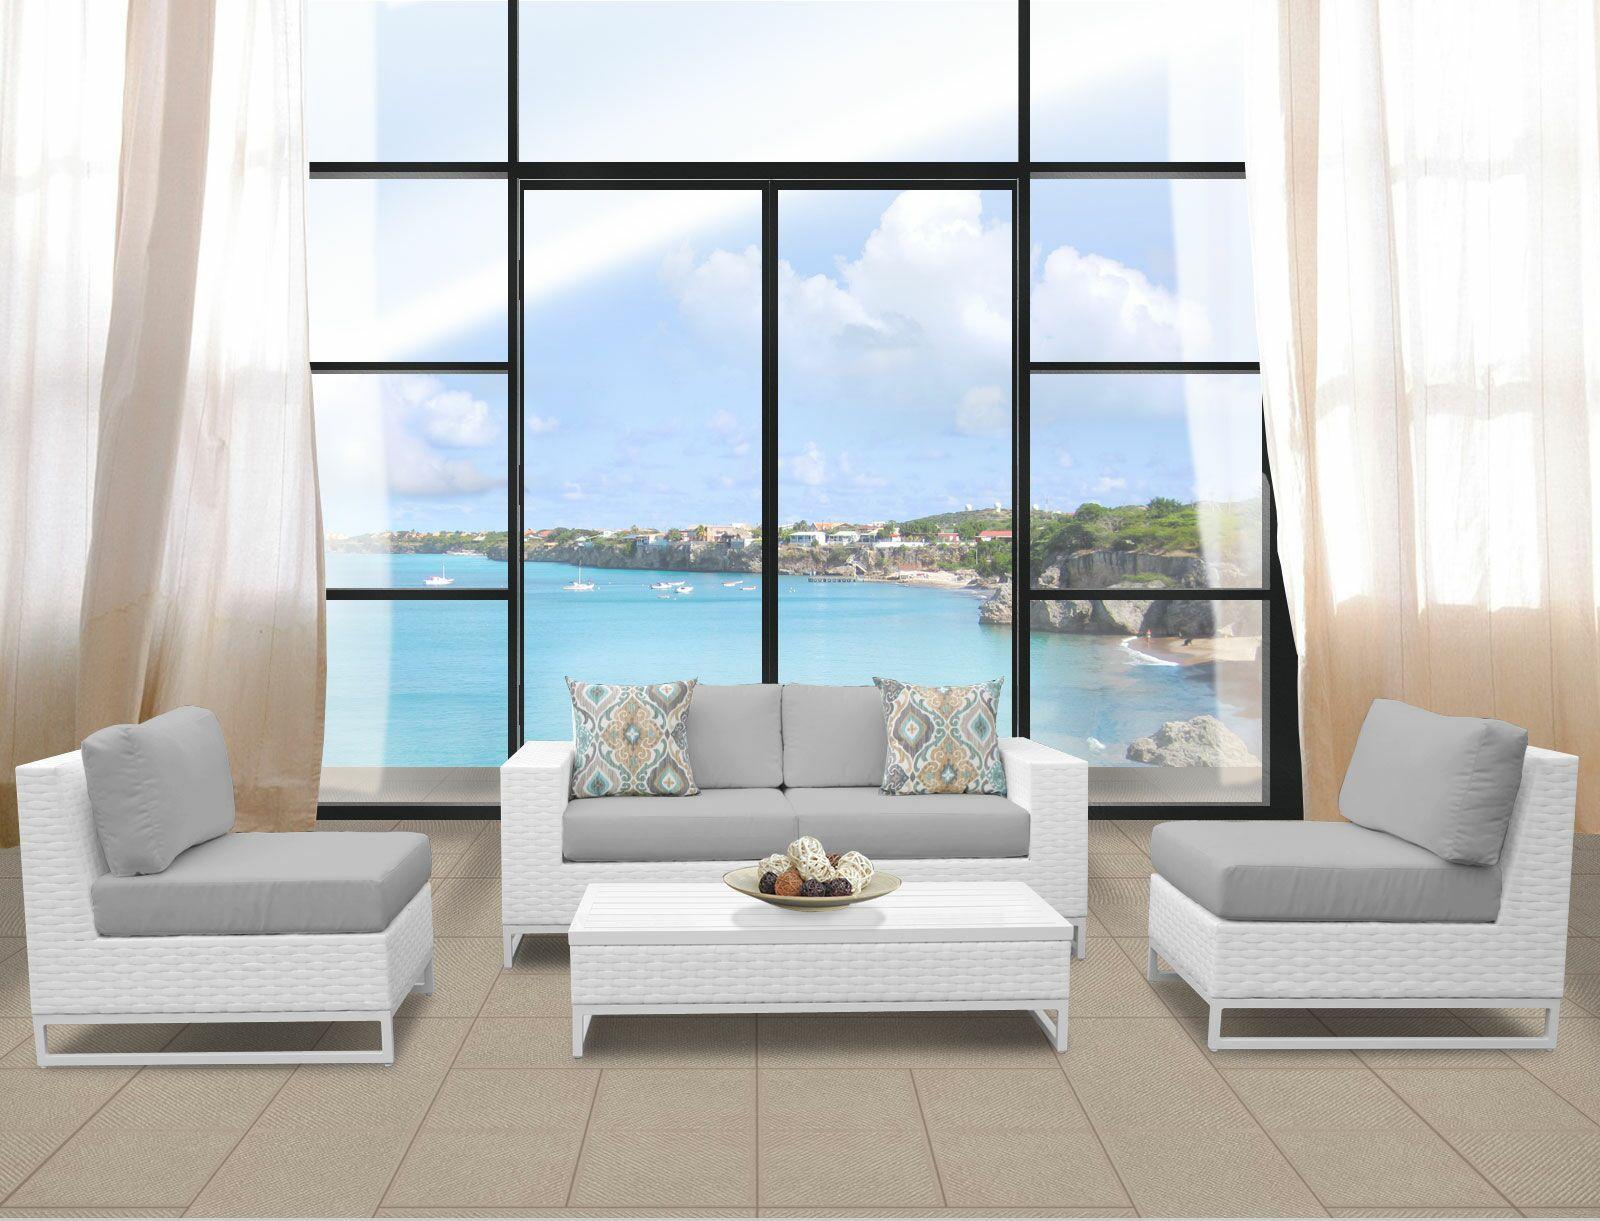 Miami 5 Piece Sofa Set with Cushions Fabric: Gray